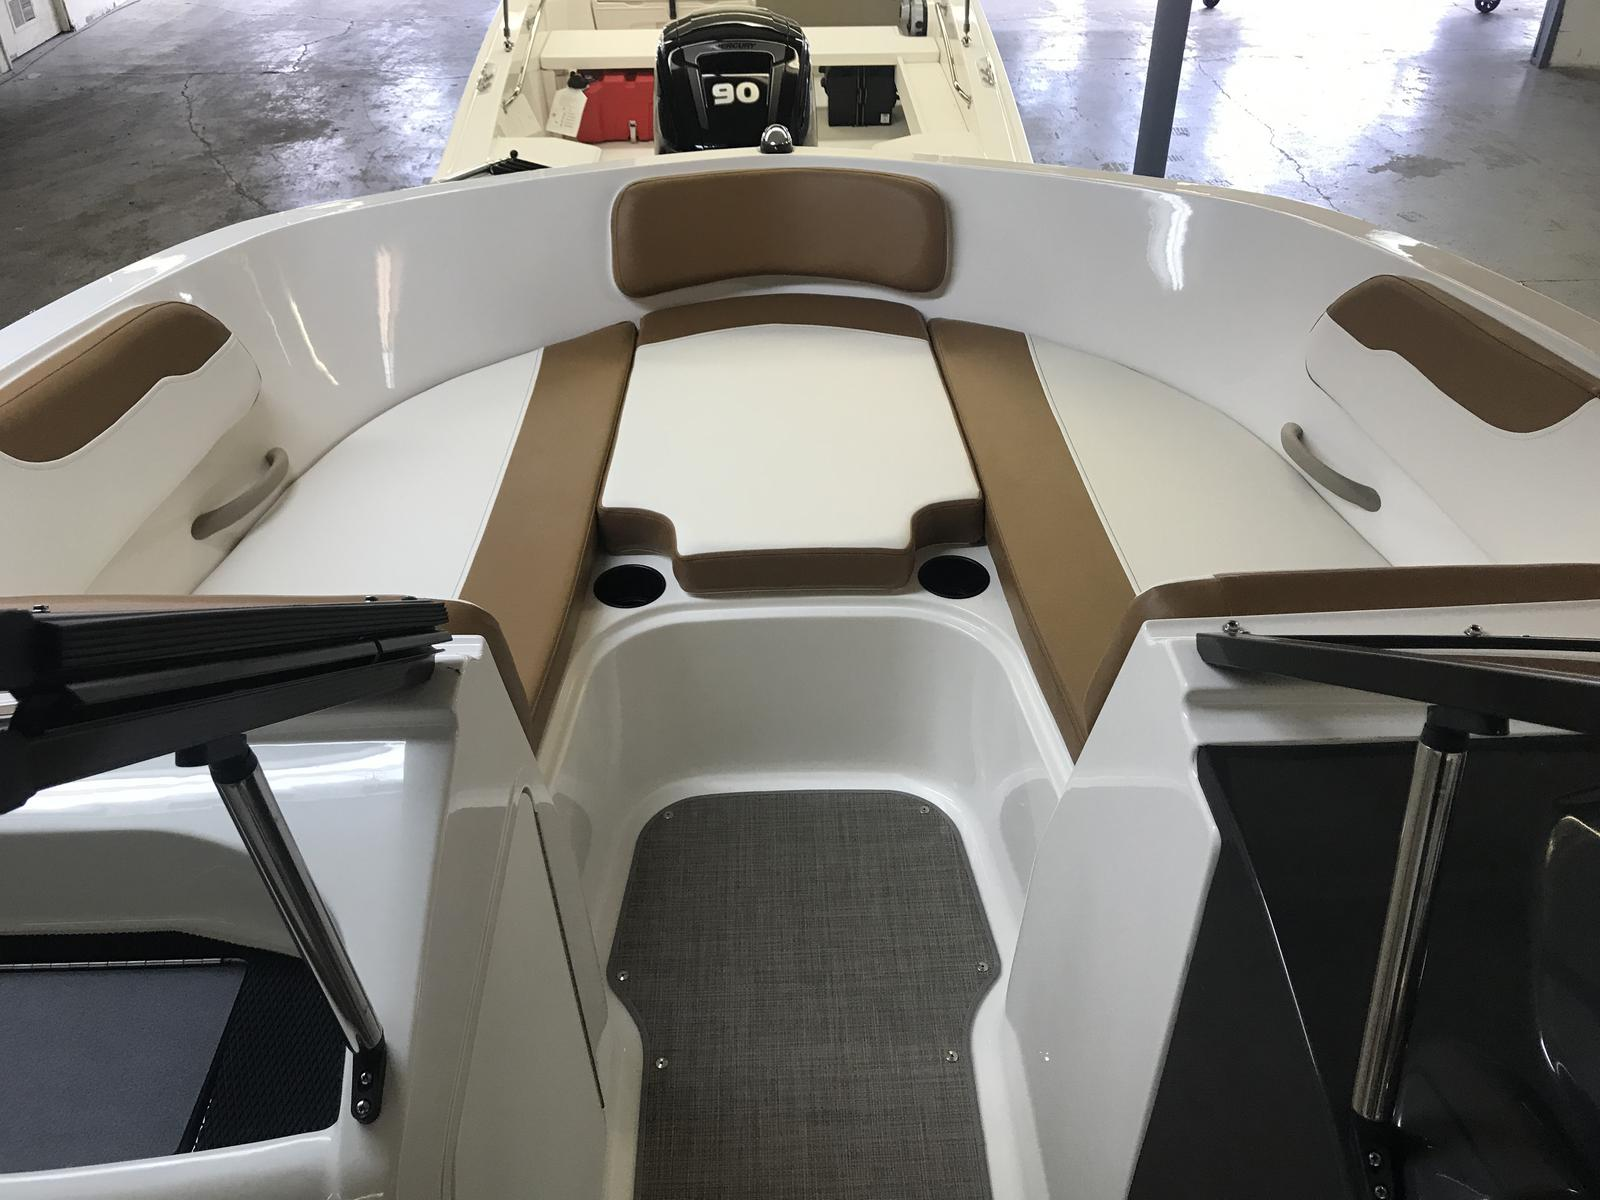 2019 Bayliner boat for sale, model of the boat is VR5 Bowrider & Image # 3 of 20